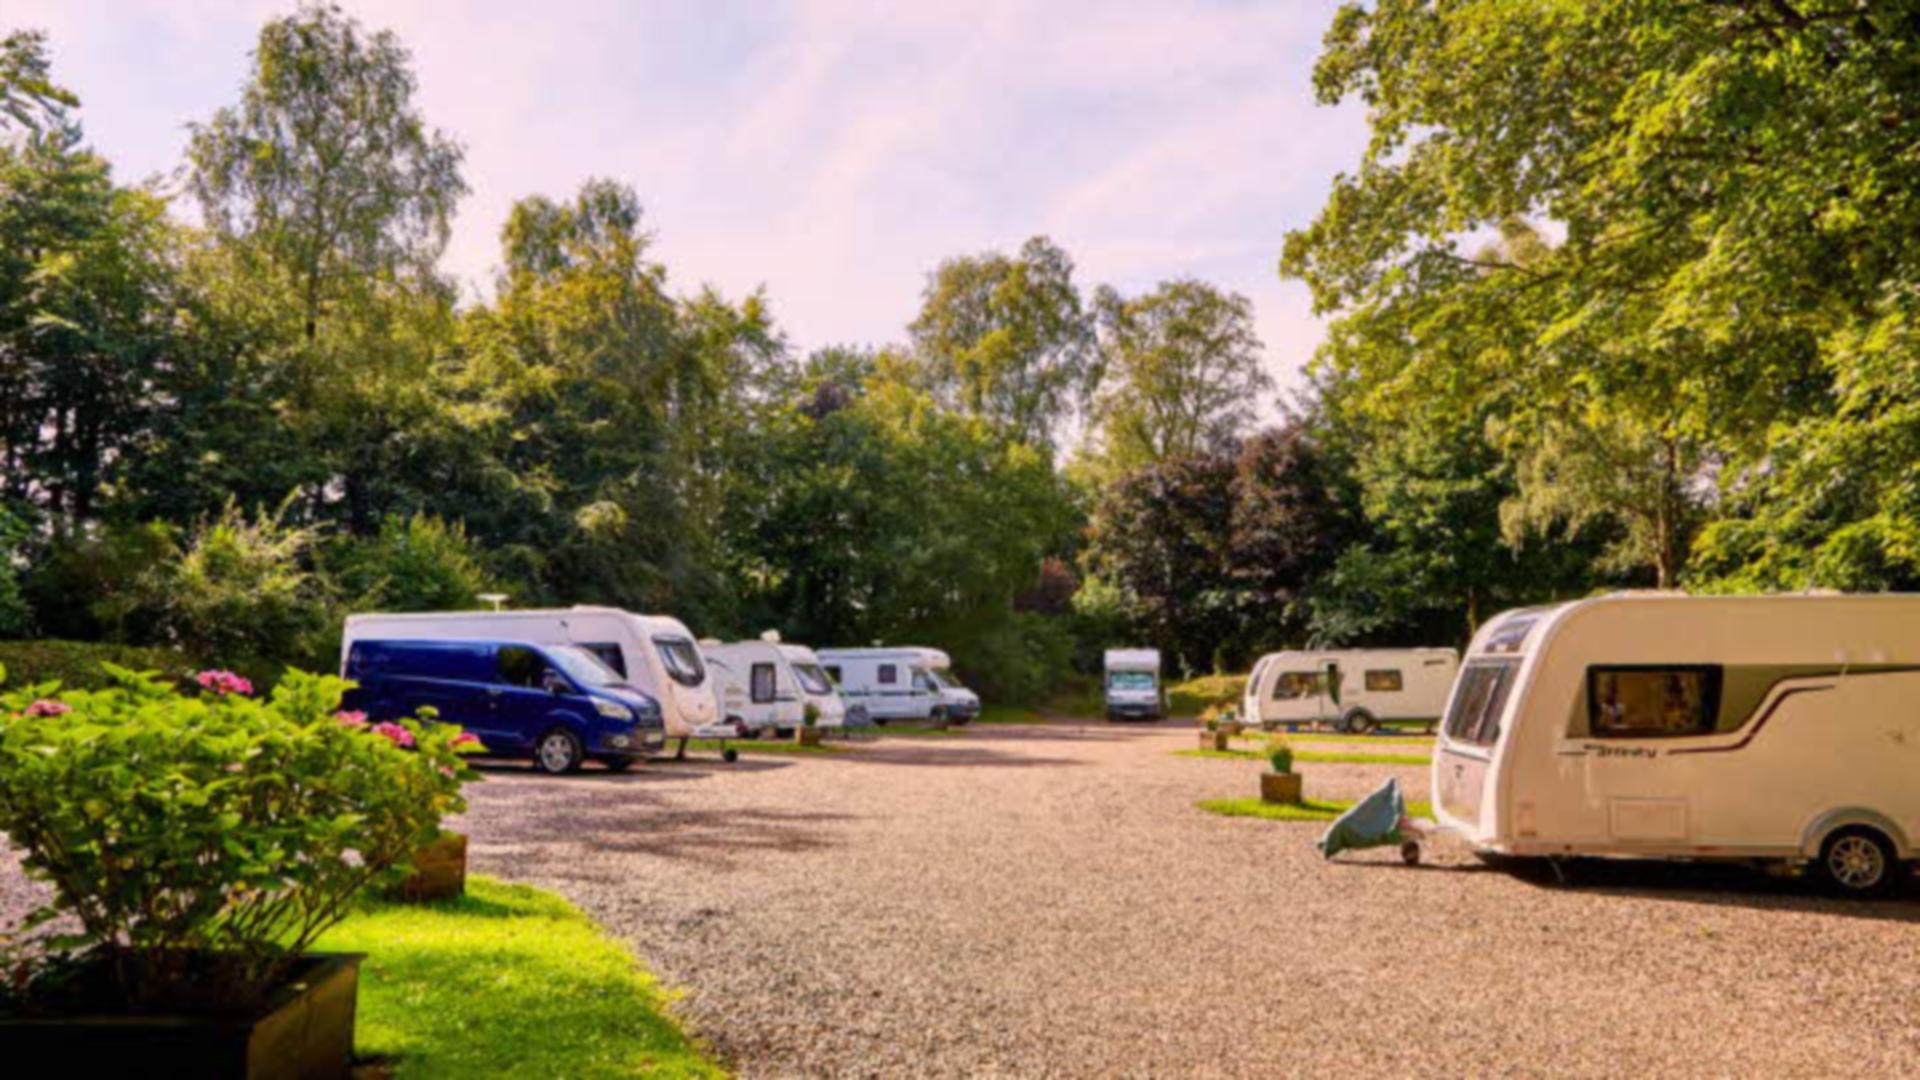 Balbirnie Park Caravan Site in Fife.